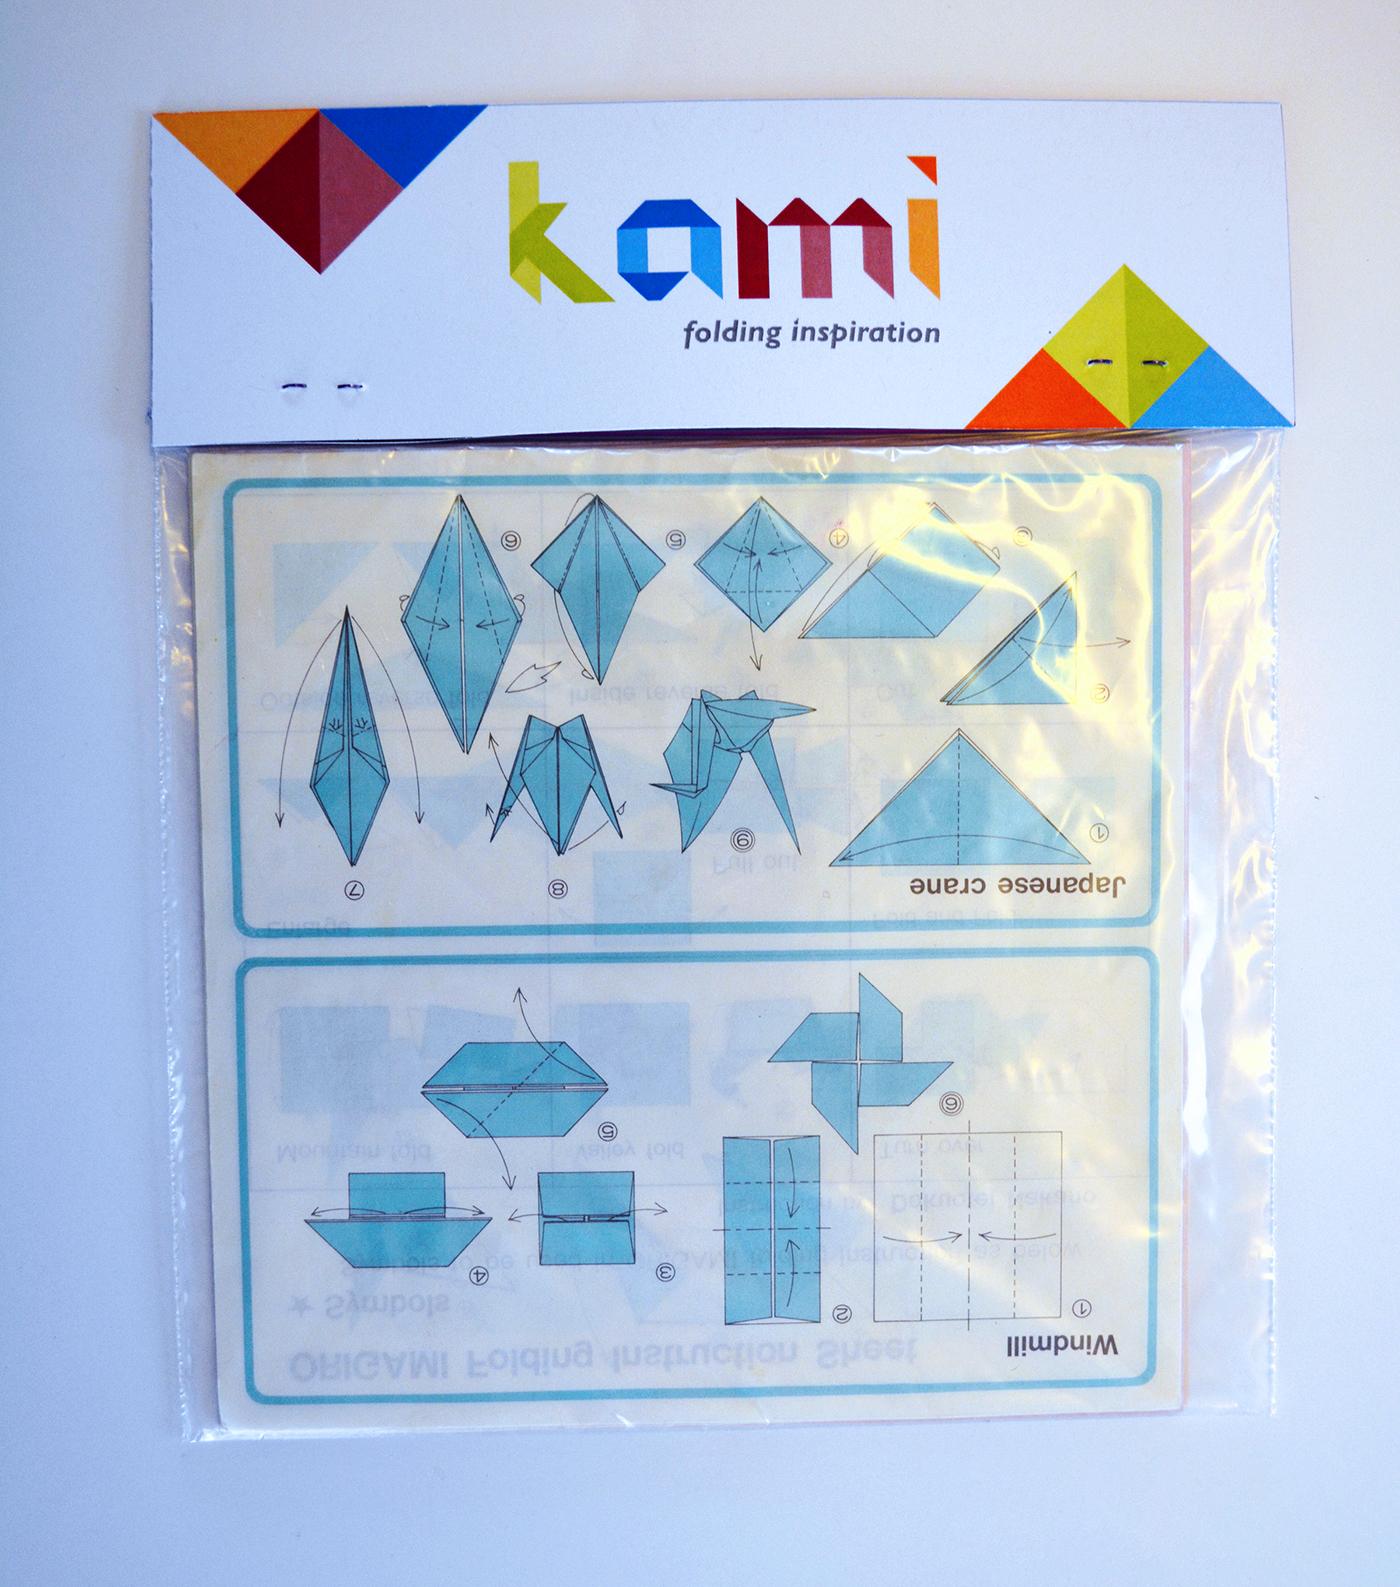 Kami: Origami Paper Company on Behance